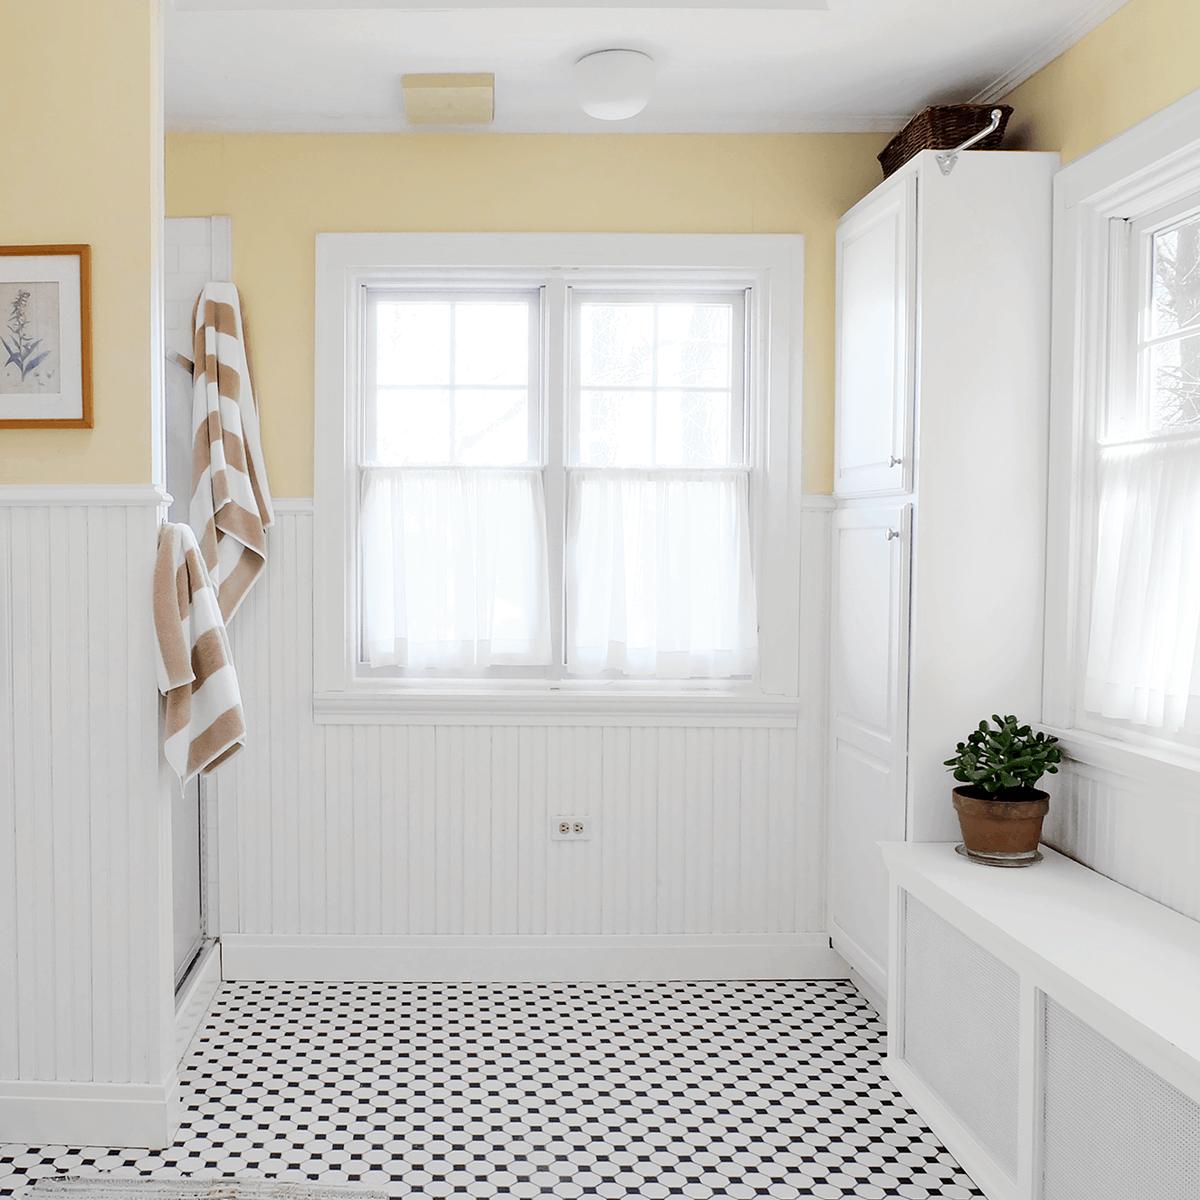 Bathroom_1.png